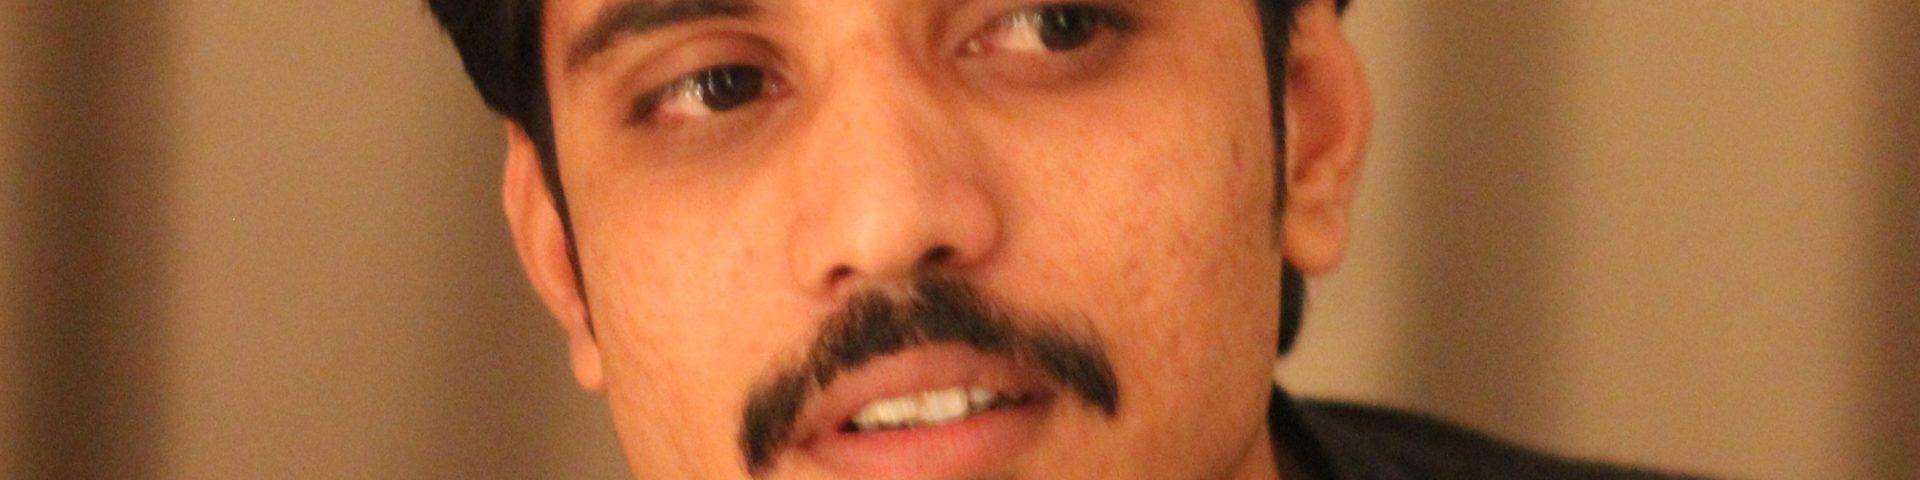 Aasif Khan bio 1920x480